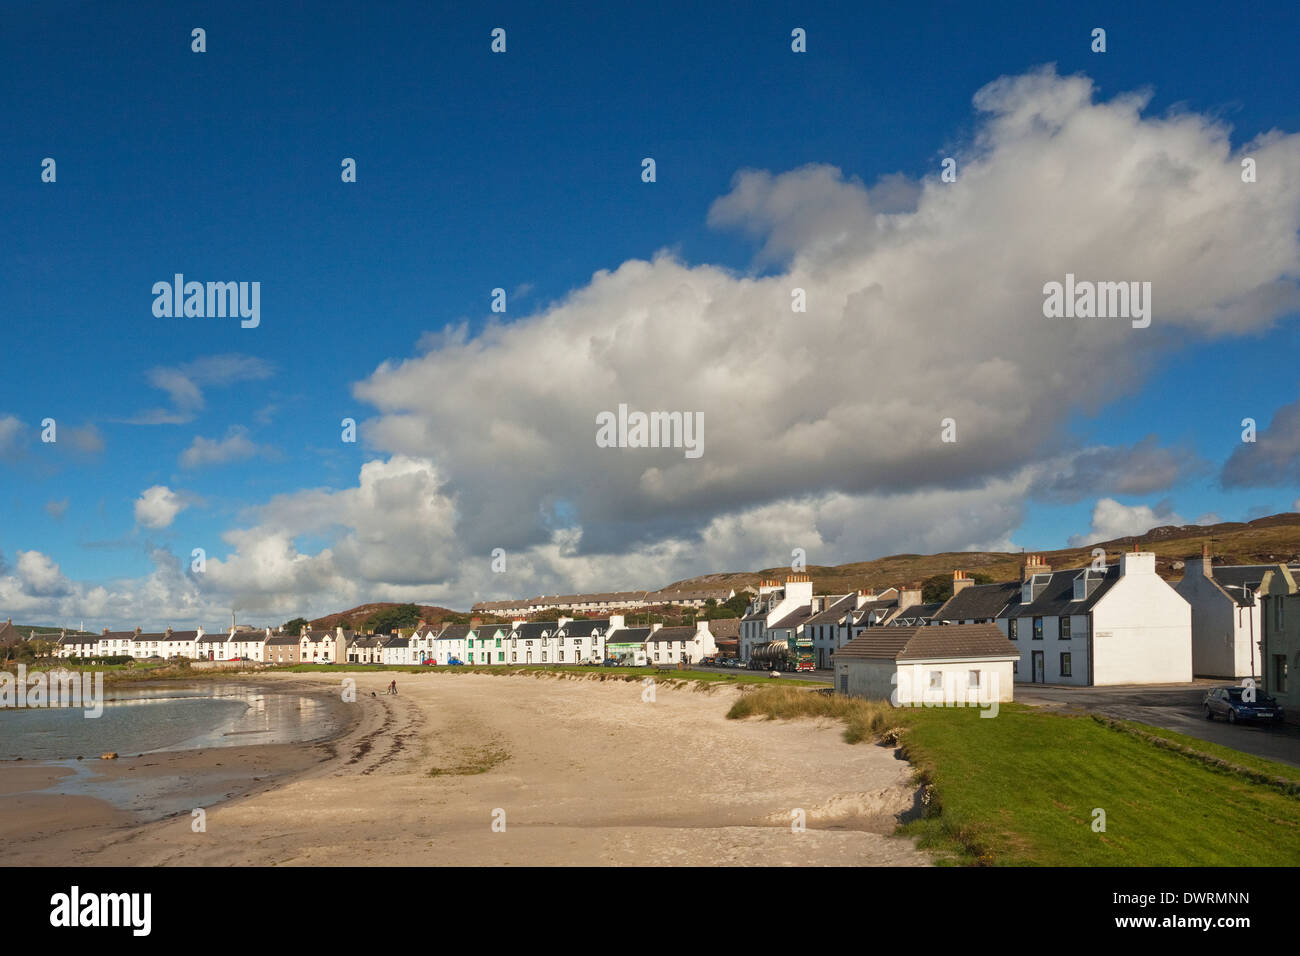 Port Ellen on the Isle of Islay - Stock Image